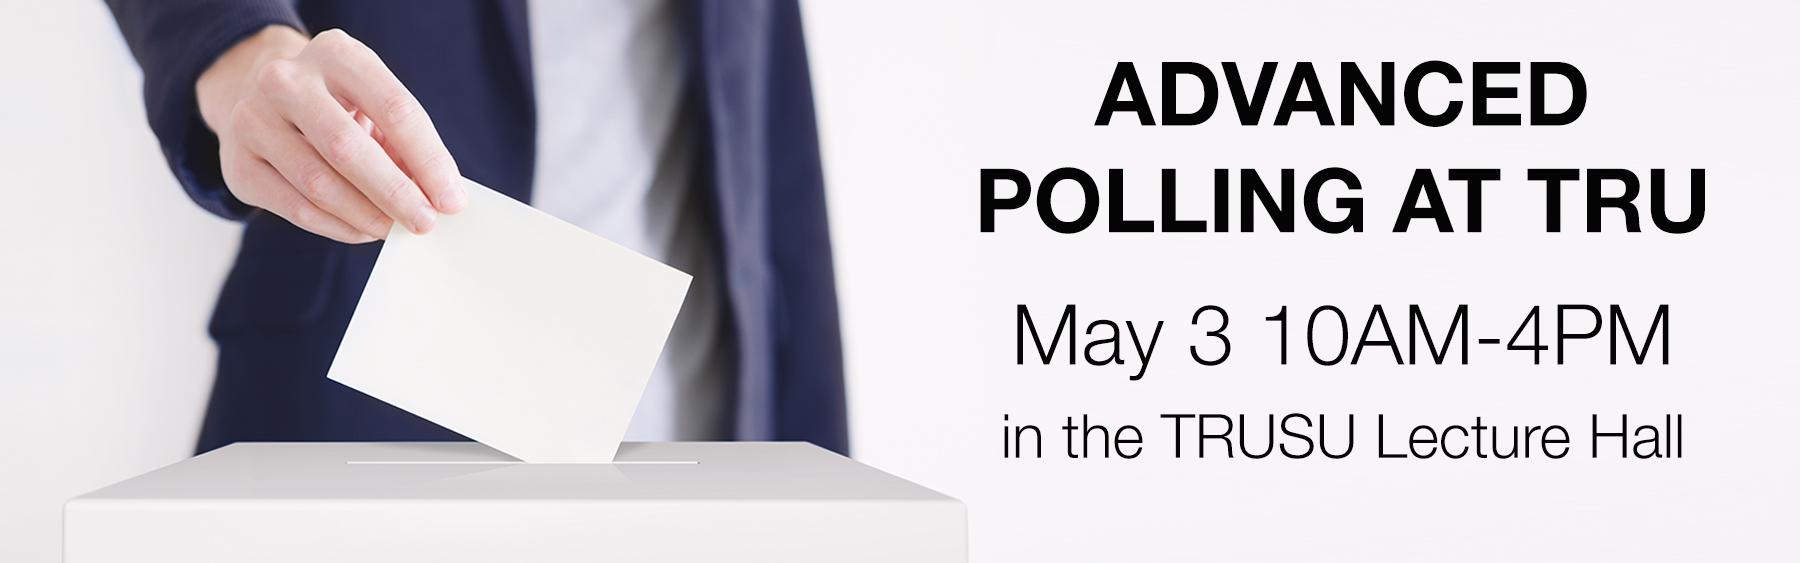 Advanced Polling Station at TRU